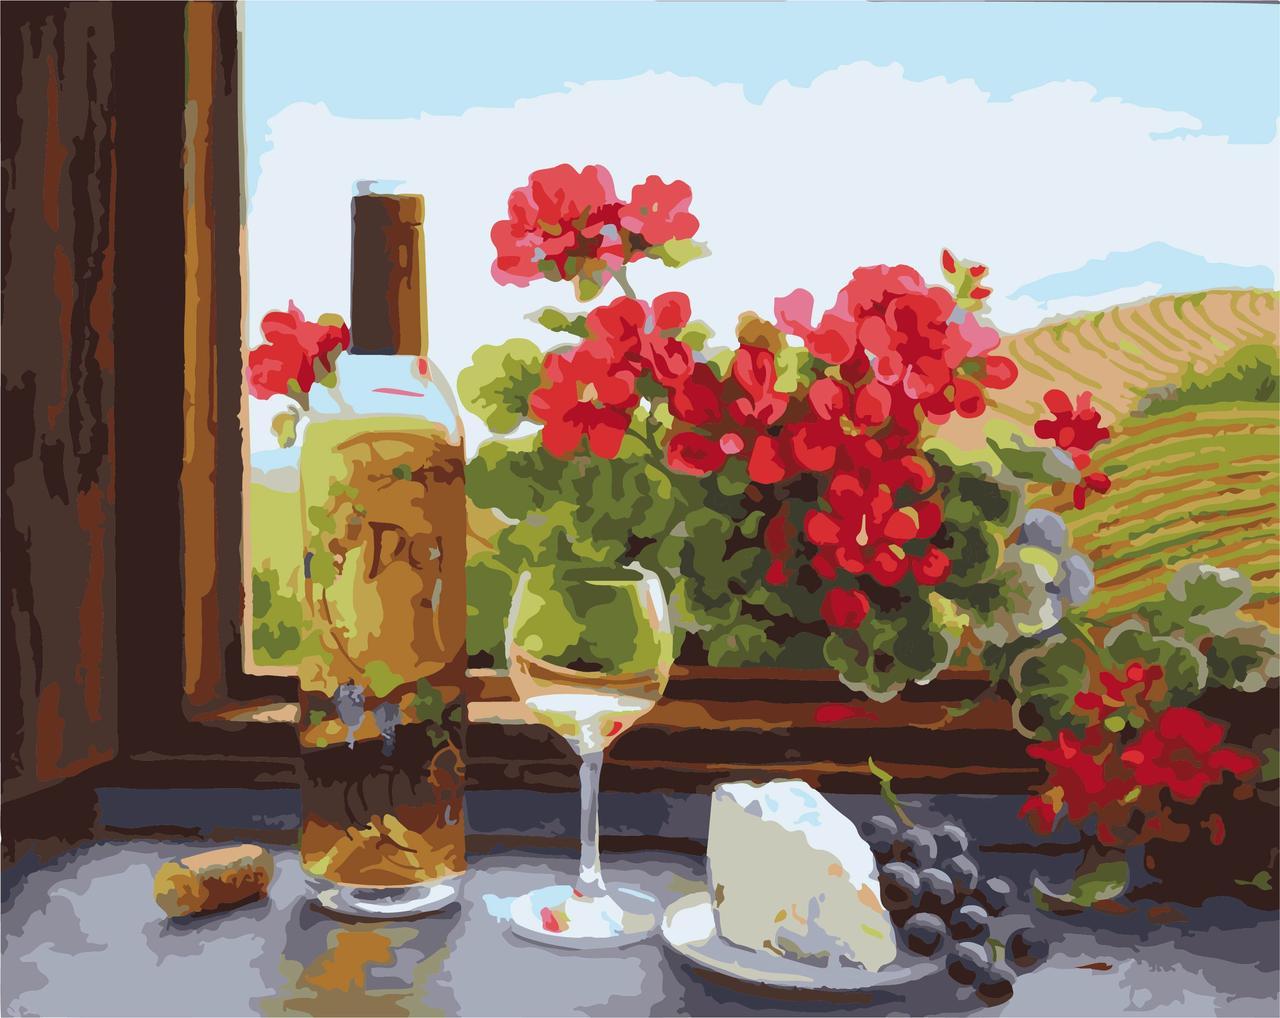 Набор для рисования Идейка Натюрморт с вином и геранью худ. Фран Ди Джакомо (KHO2205) 40 х 50 см (без коробки)